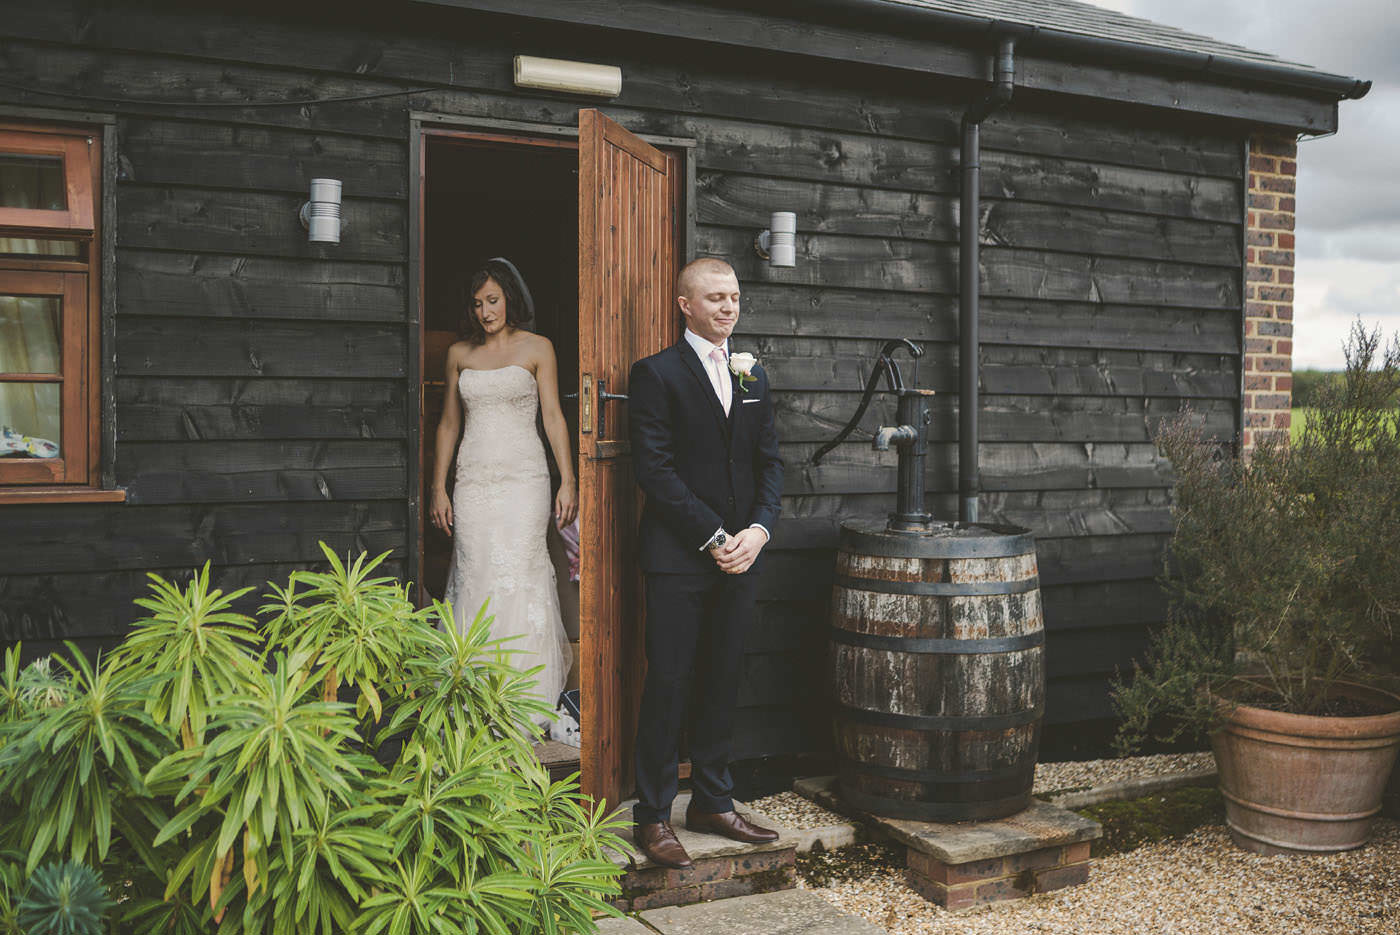 adamzoe gate street barn wedding photographer 0033